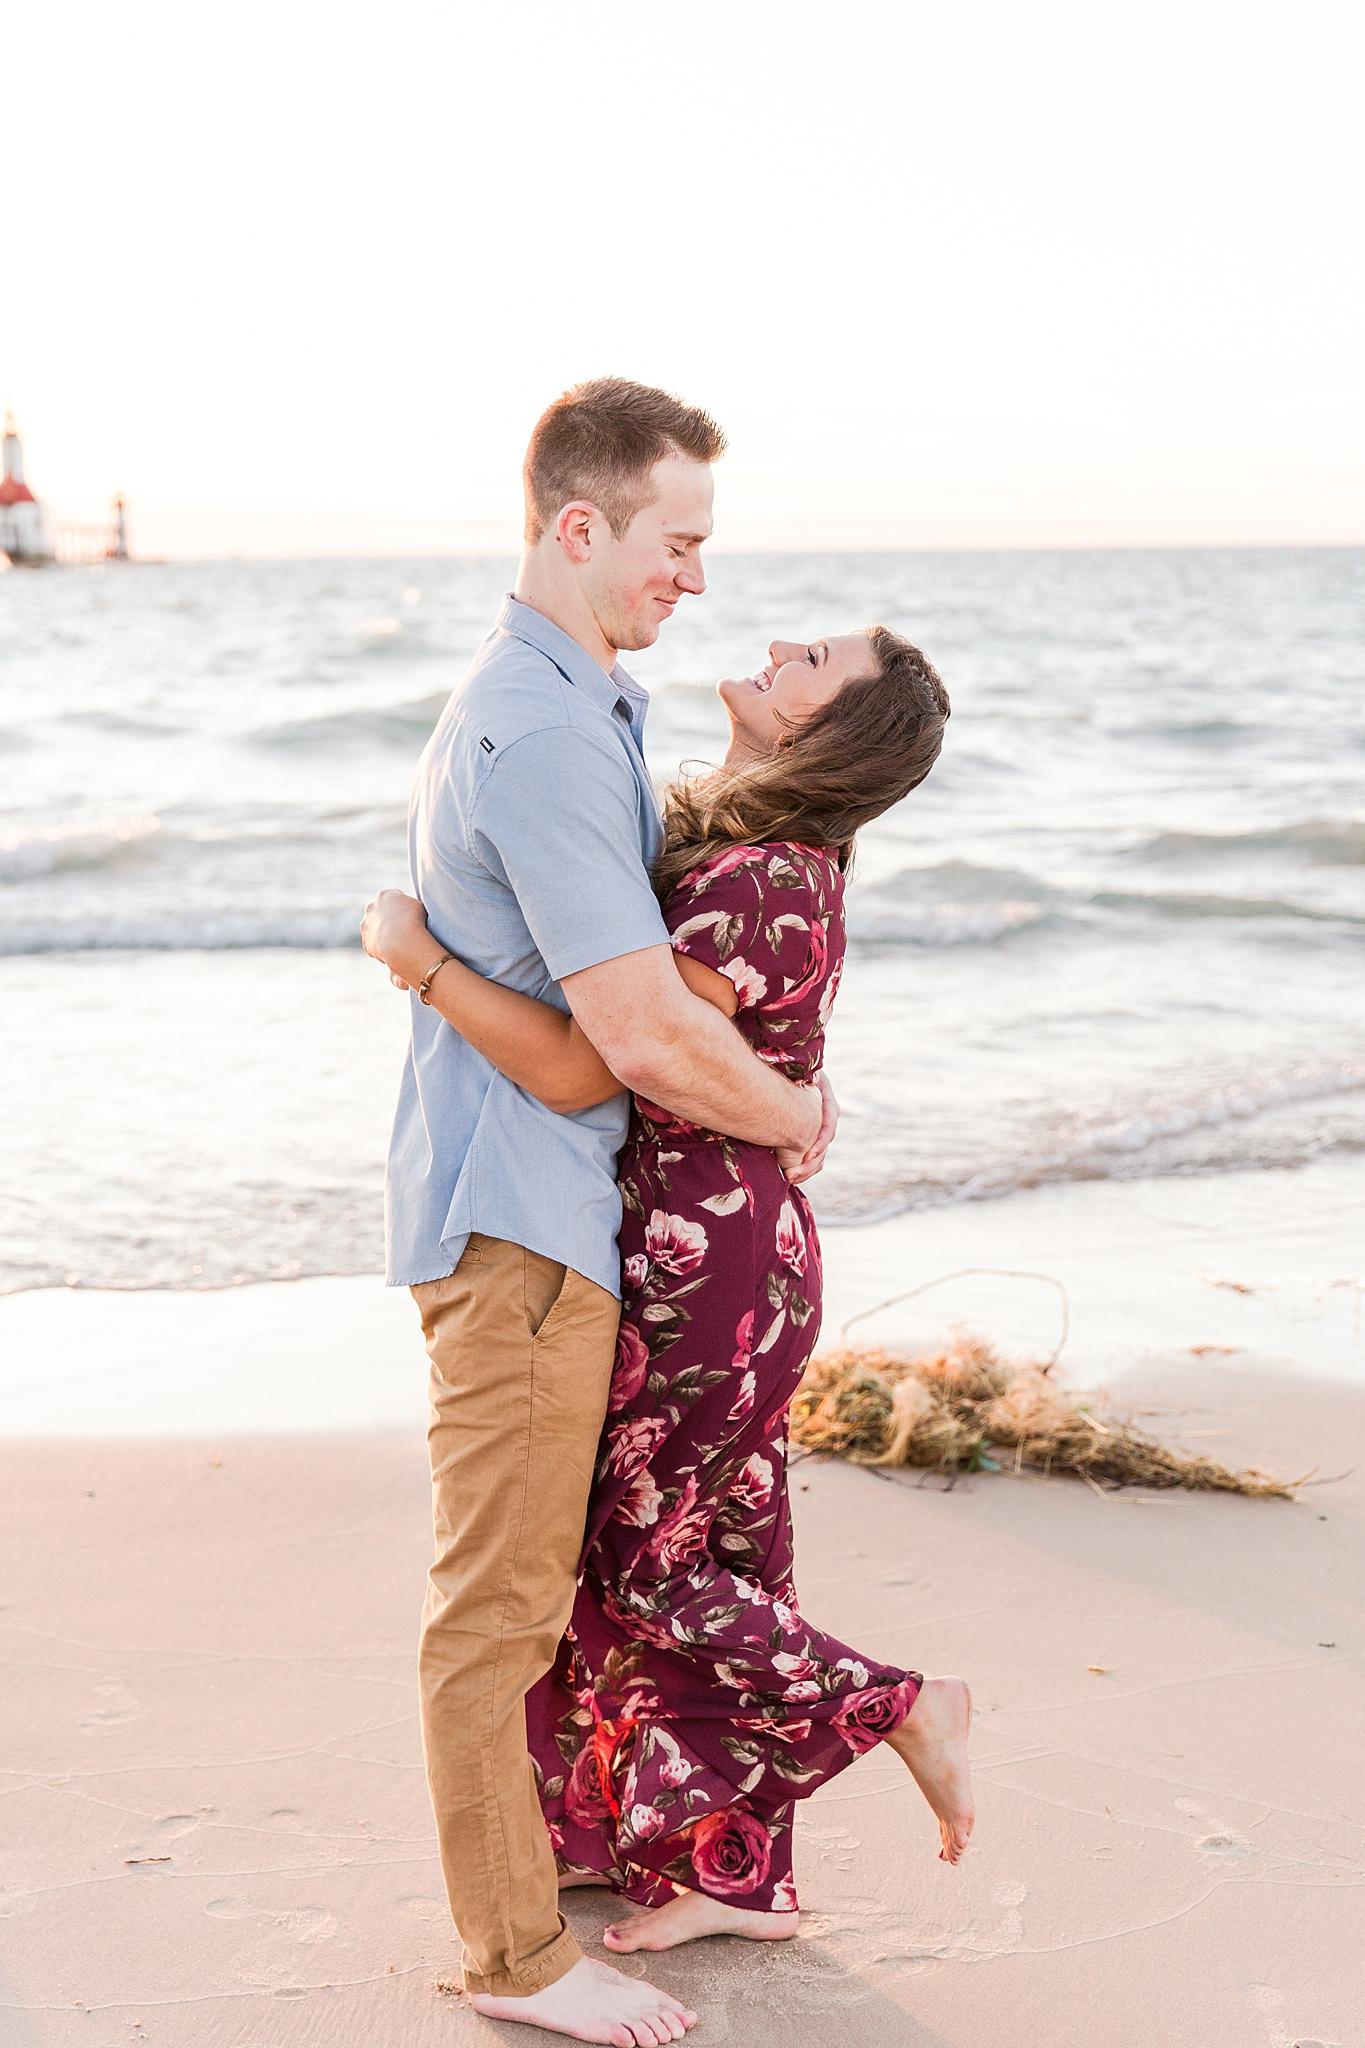 romantic--summer-beach-engagement-photography-in-st-joseph-mi-by-courtney-carolyn-photography_0020.jpg